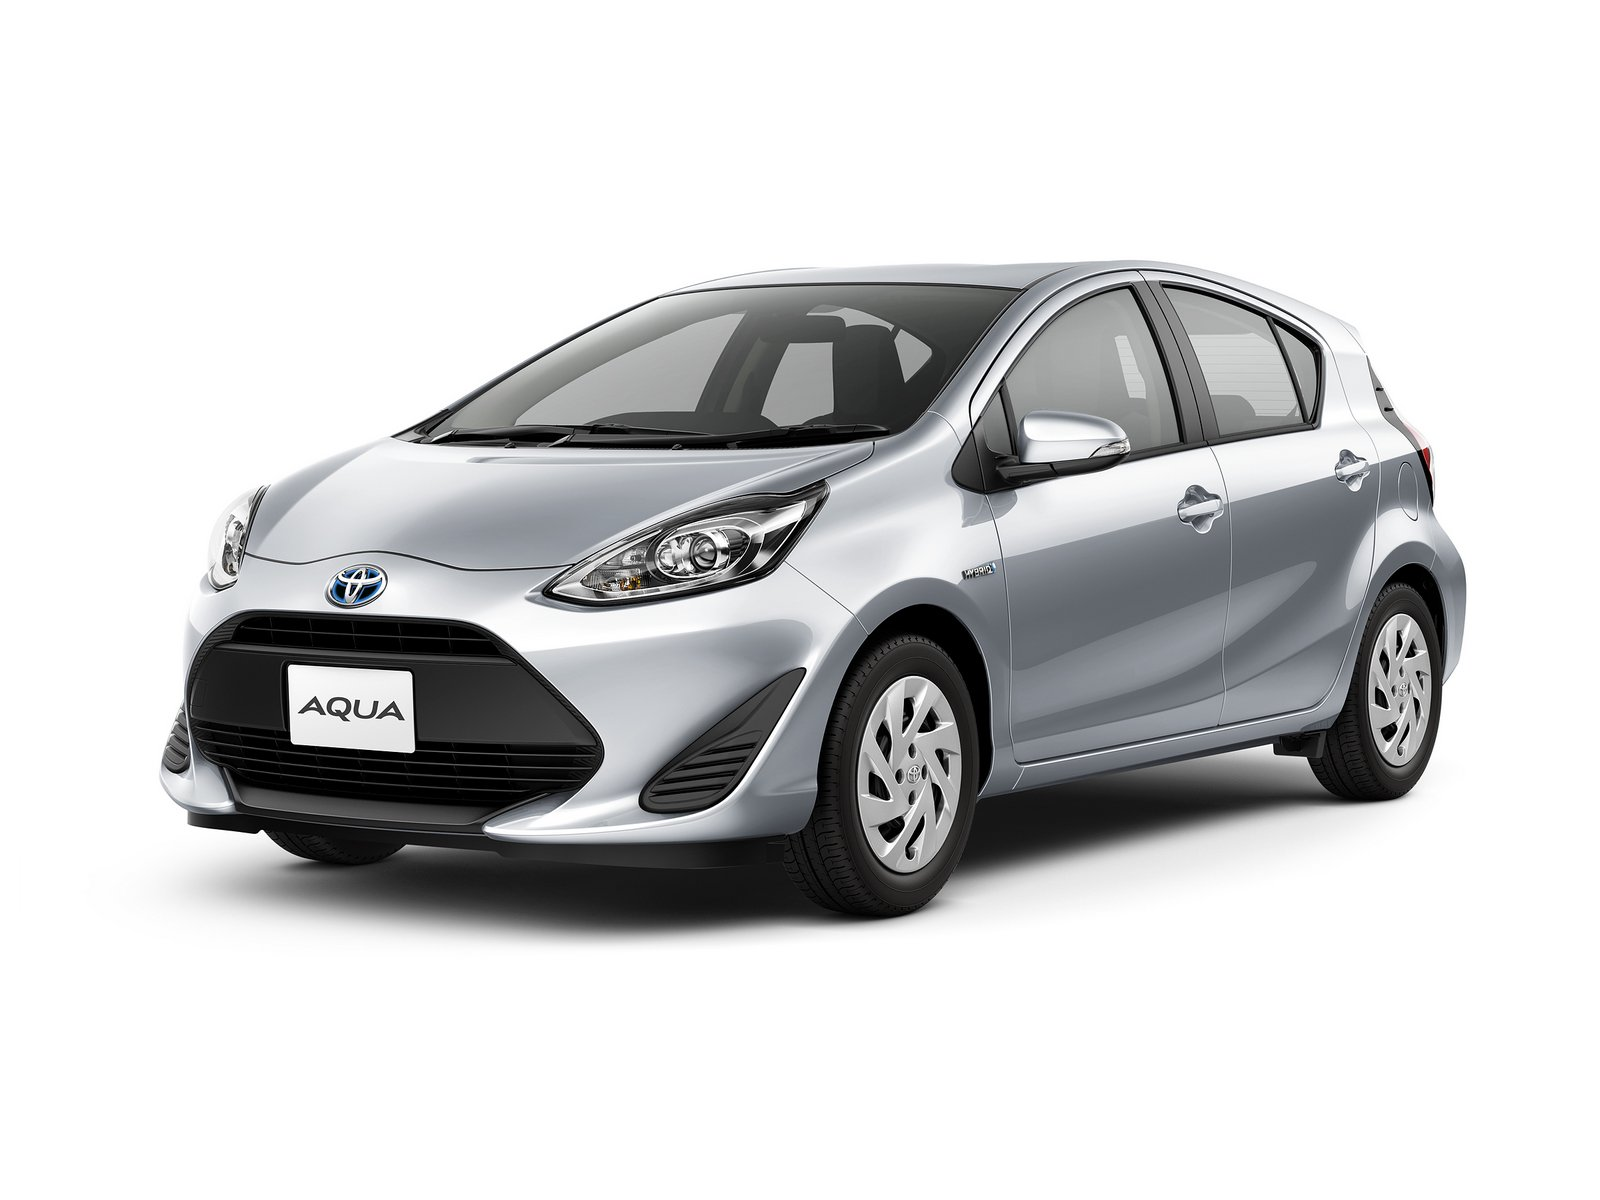 2018_Toyota_Aqua_facelift_16